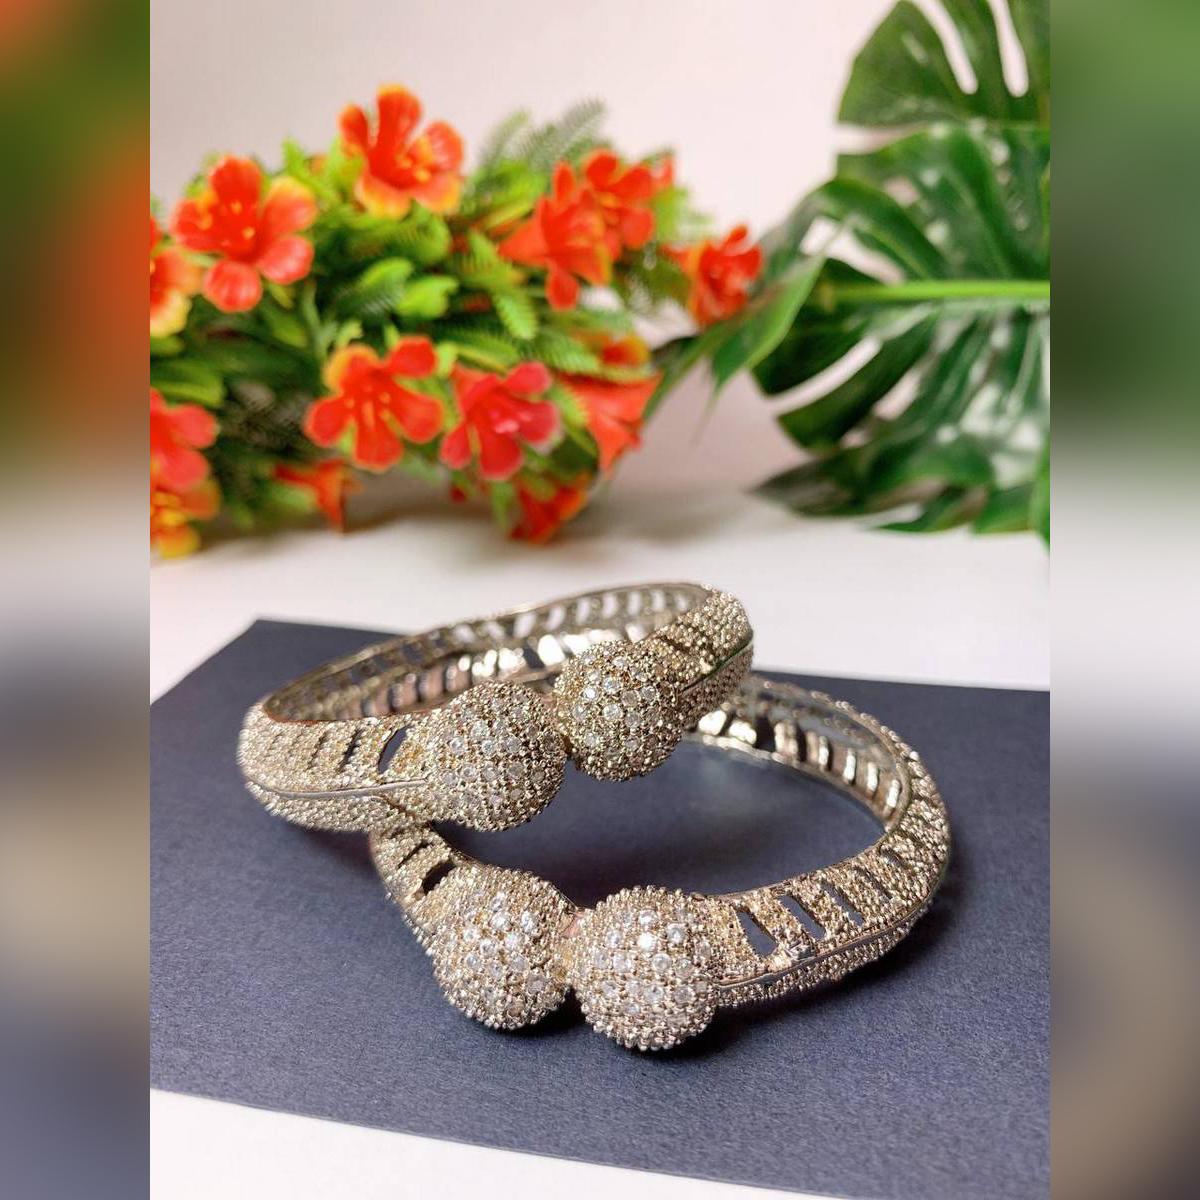 Bangles - Set of 2 pieces - fine Quality bangles – Jewelry- New design - Stylish Set - Wedding Jeweller- jewllery for girl woman - Budget to gift - Bangles For Girls - Anosheys studio